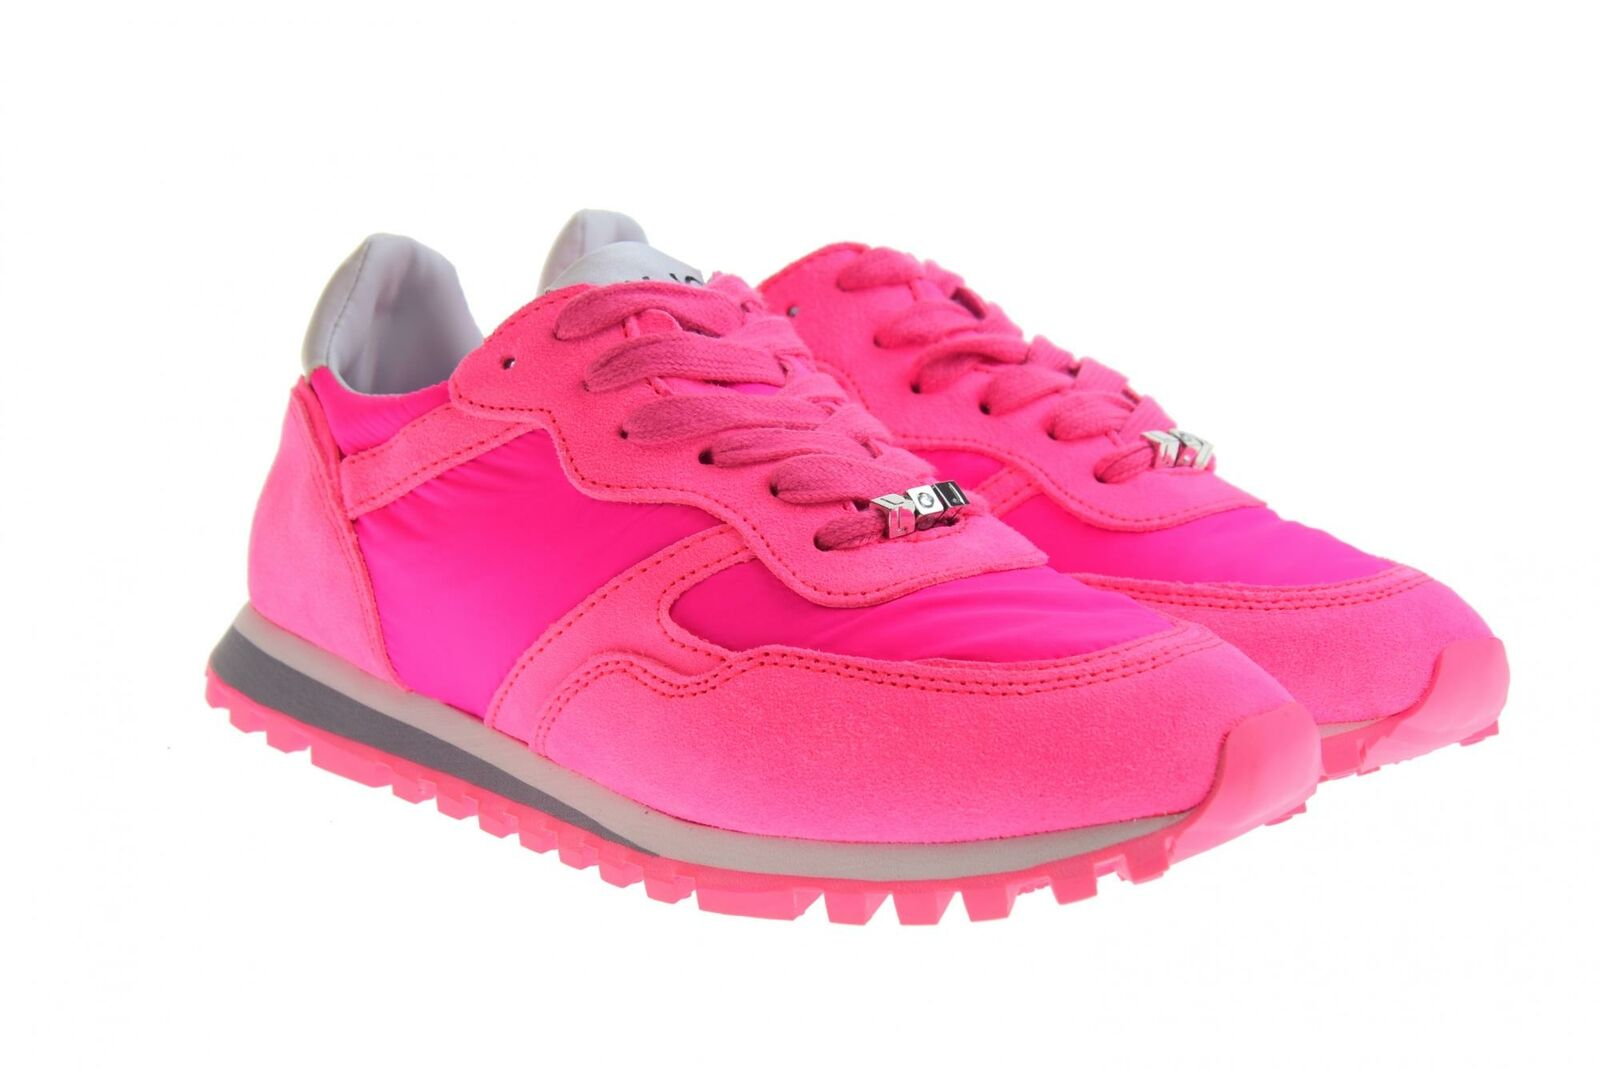 Liu Jo P19us woman low sneakers ALEXA BXX049PX003S16F1 FUCHSIA FLUO